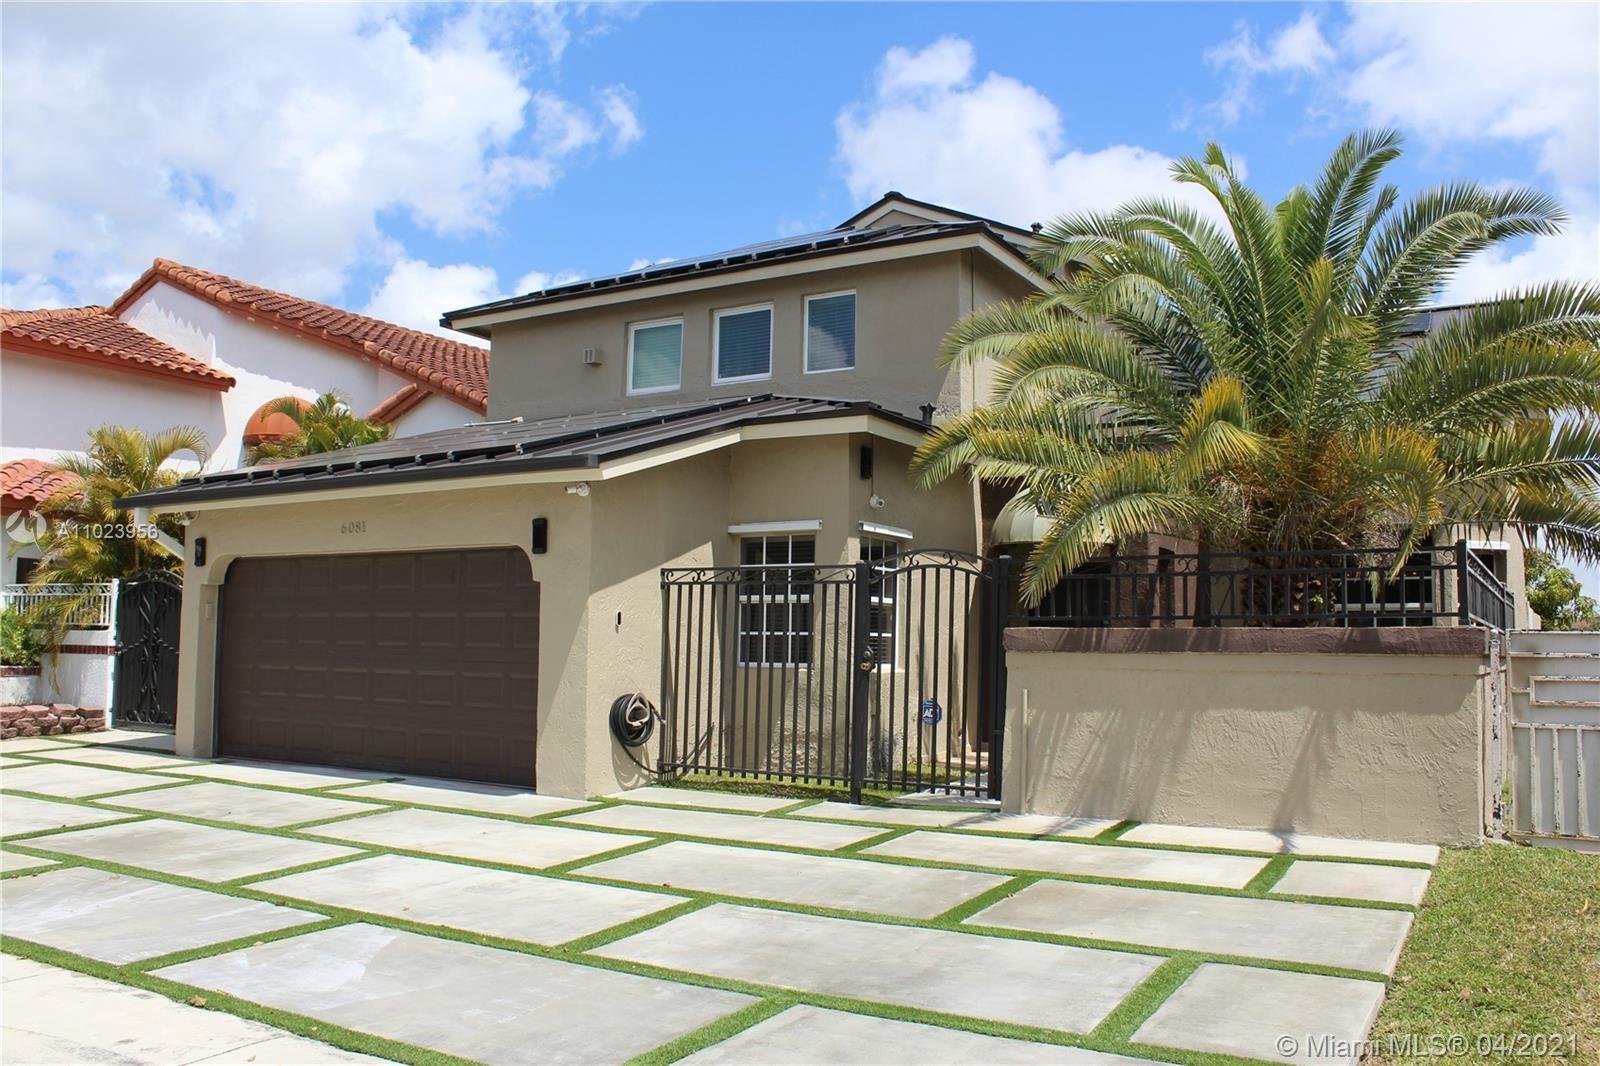 6081 SW 153rd Court Rd, Miami, FL 33193 - #: A11023956